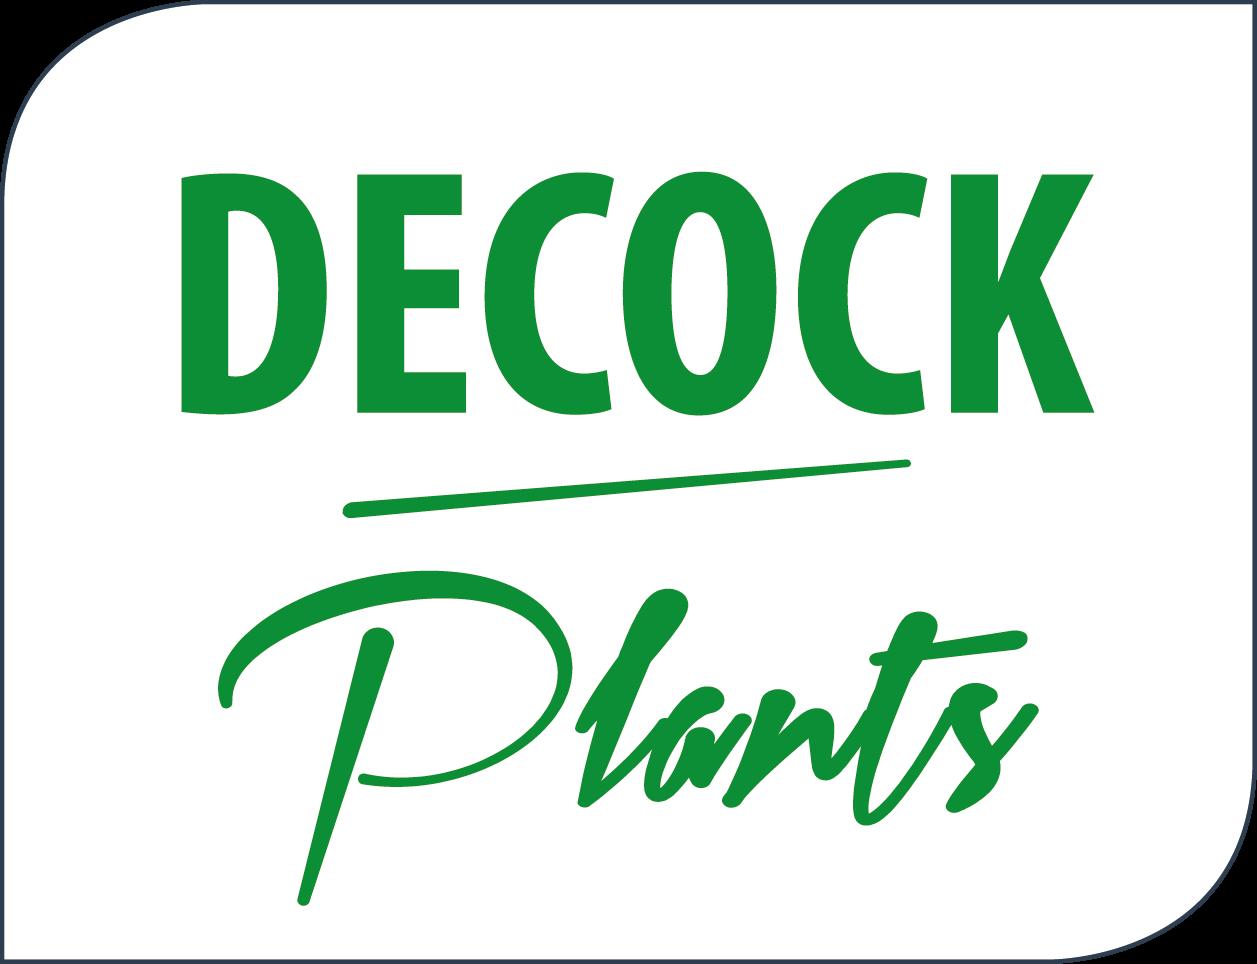 Decock-Plants-logo 2018.png